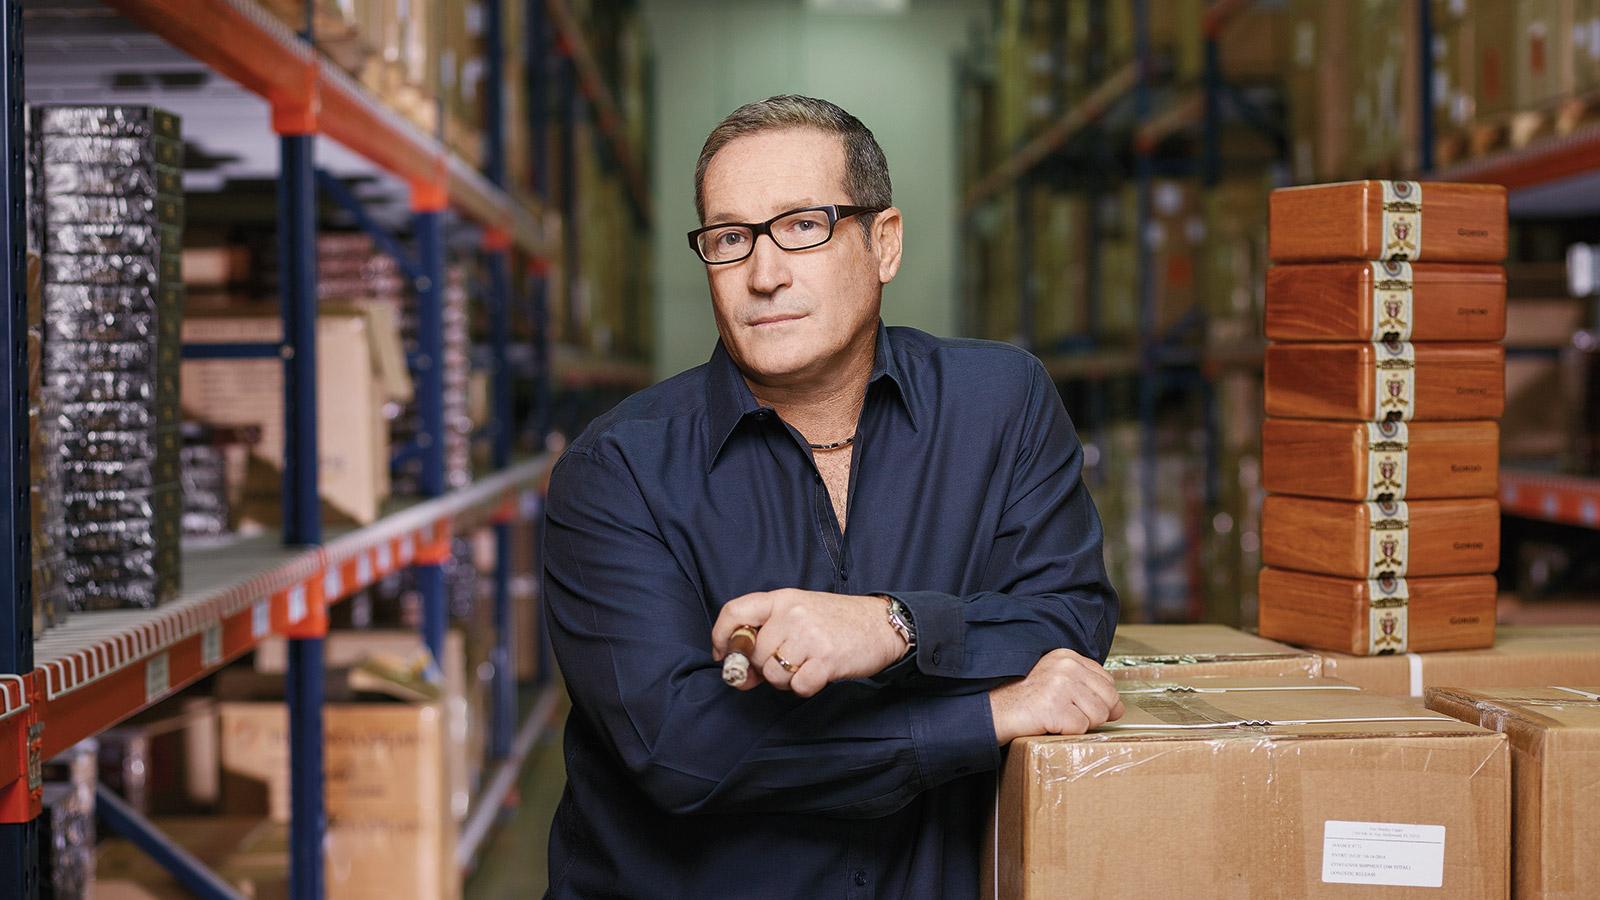 Alan Rubin, owner of Alec Bradley cigars, in his warehouse in Dania, Florida.